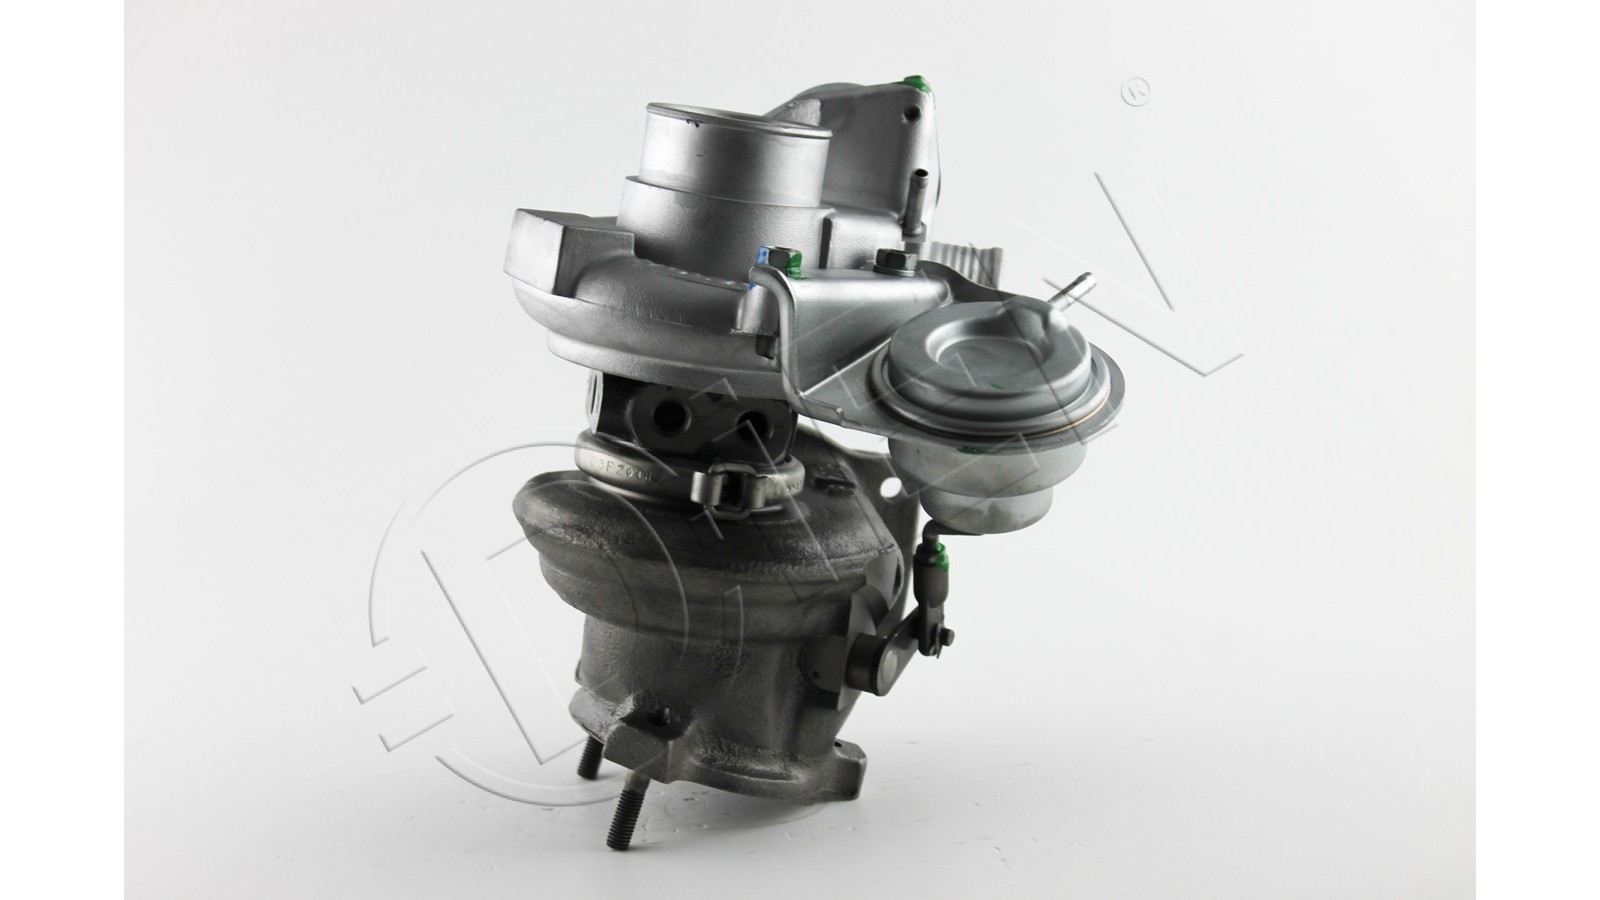 Turbocompressore  VOLVO  S40 I  2.0 T4  200Cv  1948ccm  lug 2000 - dic 2003